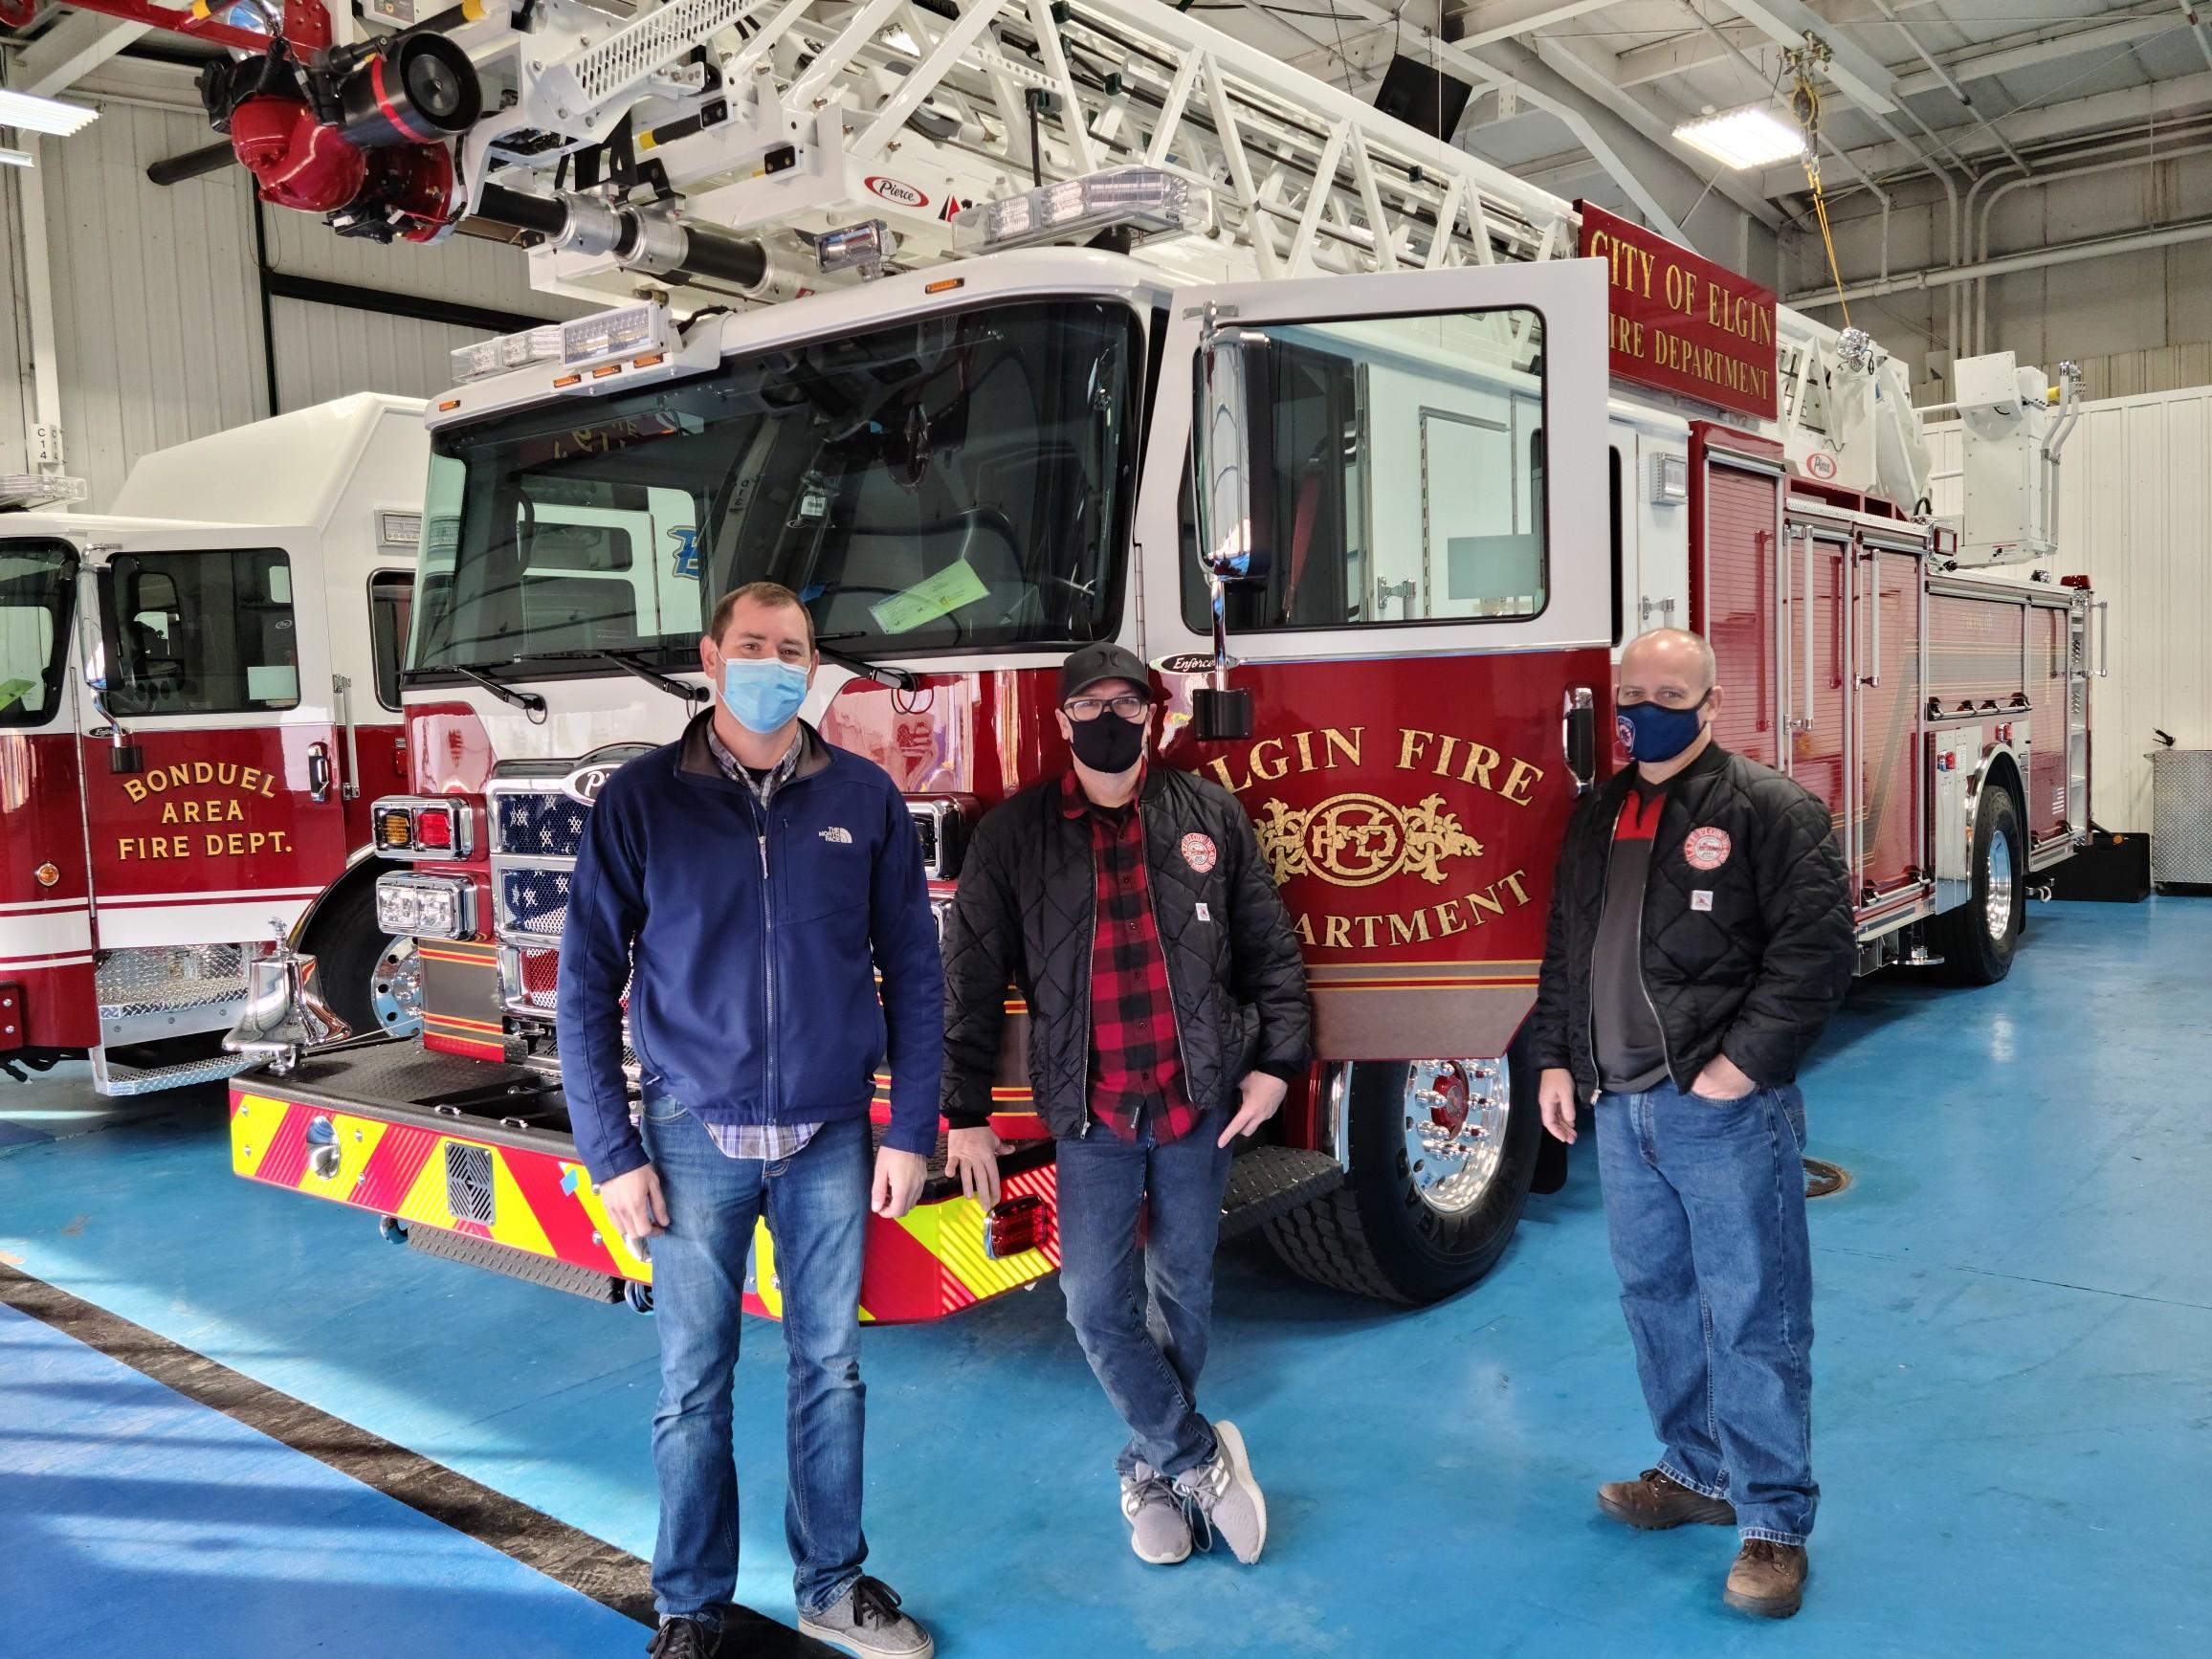 Elgin Fire Department - Aerial